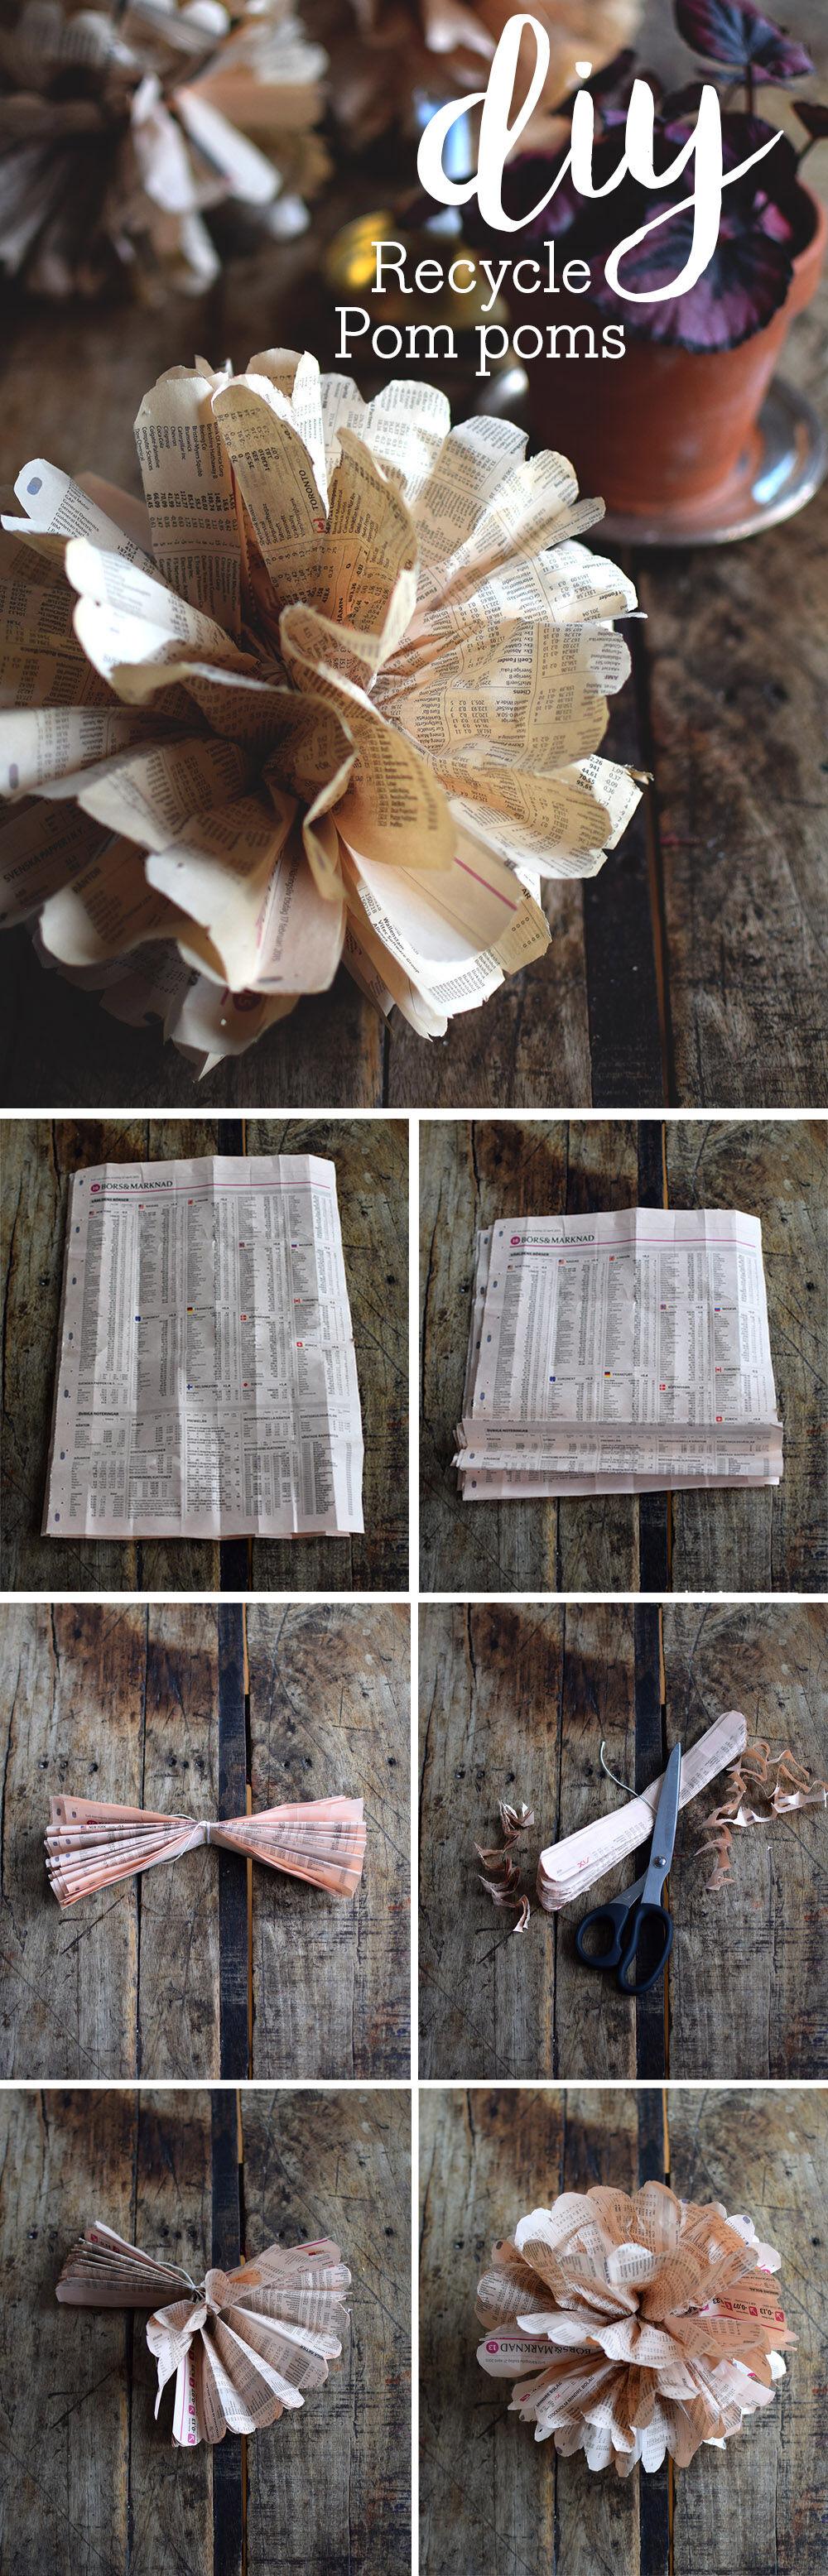 pom_pom_recycled_paper